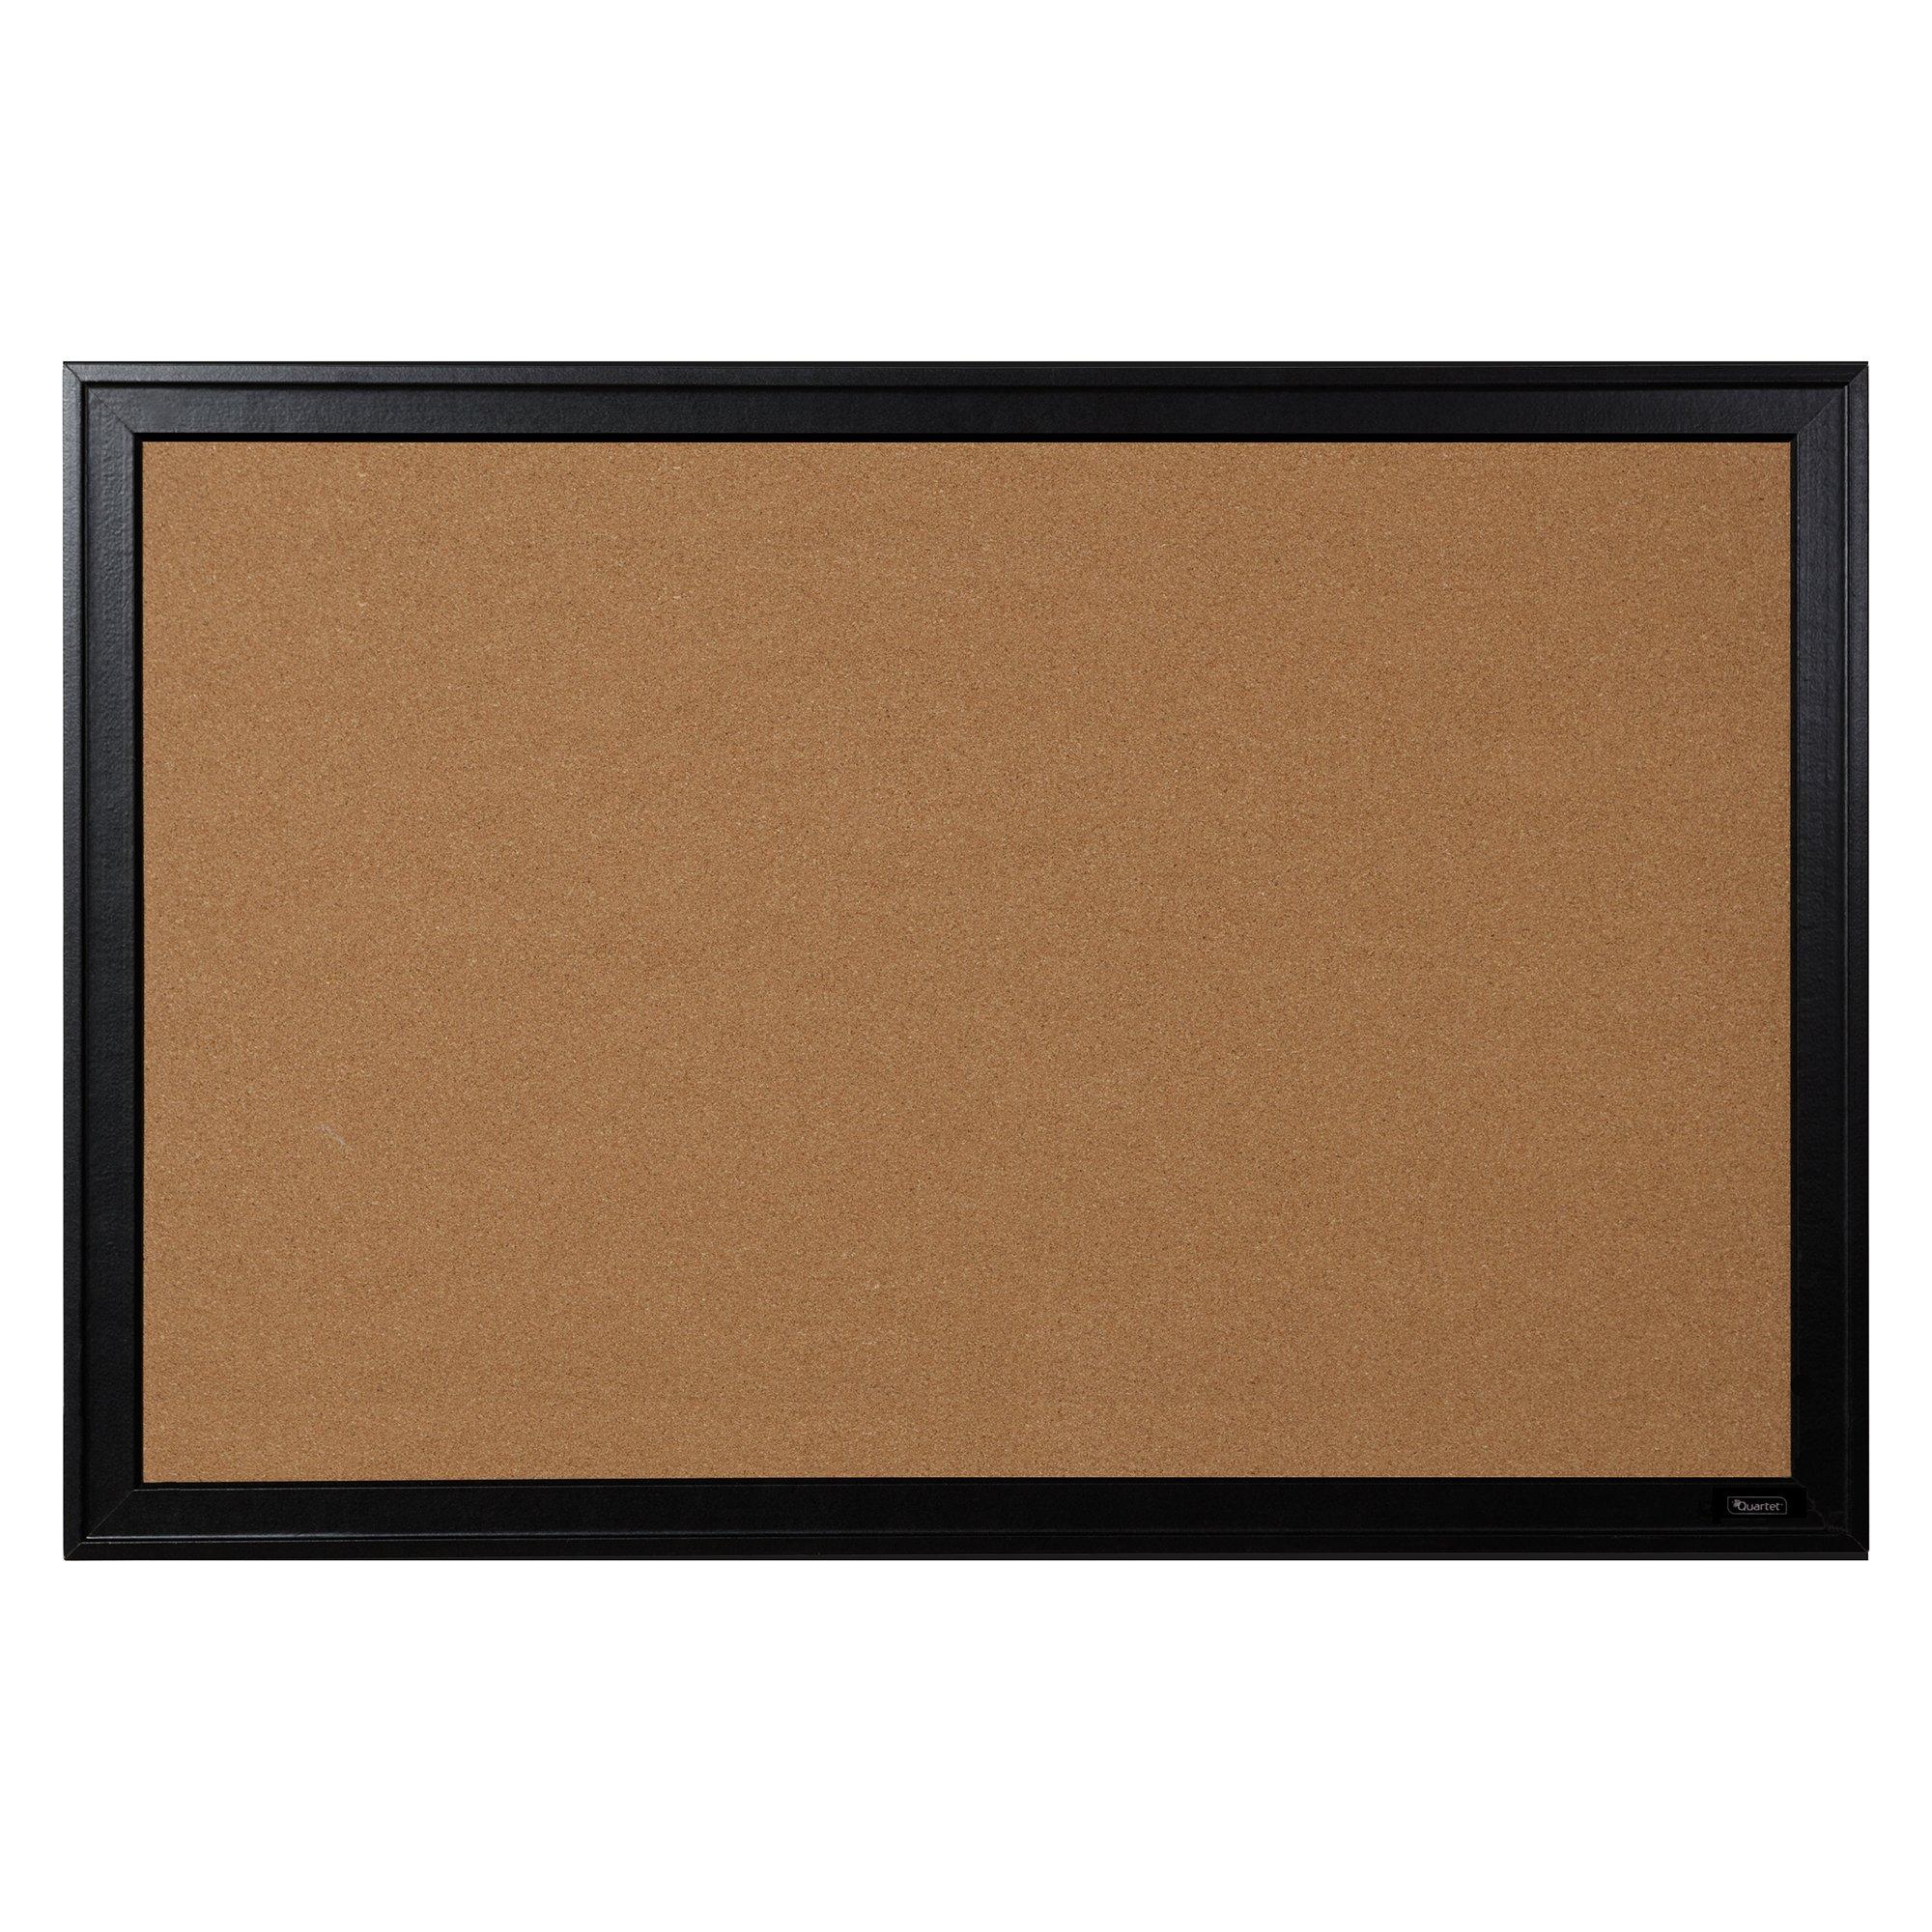 Quartet Bulletin Board, Cork, 24''x36'', Black Frame (13769)